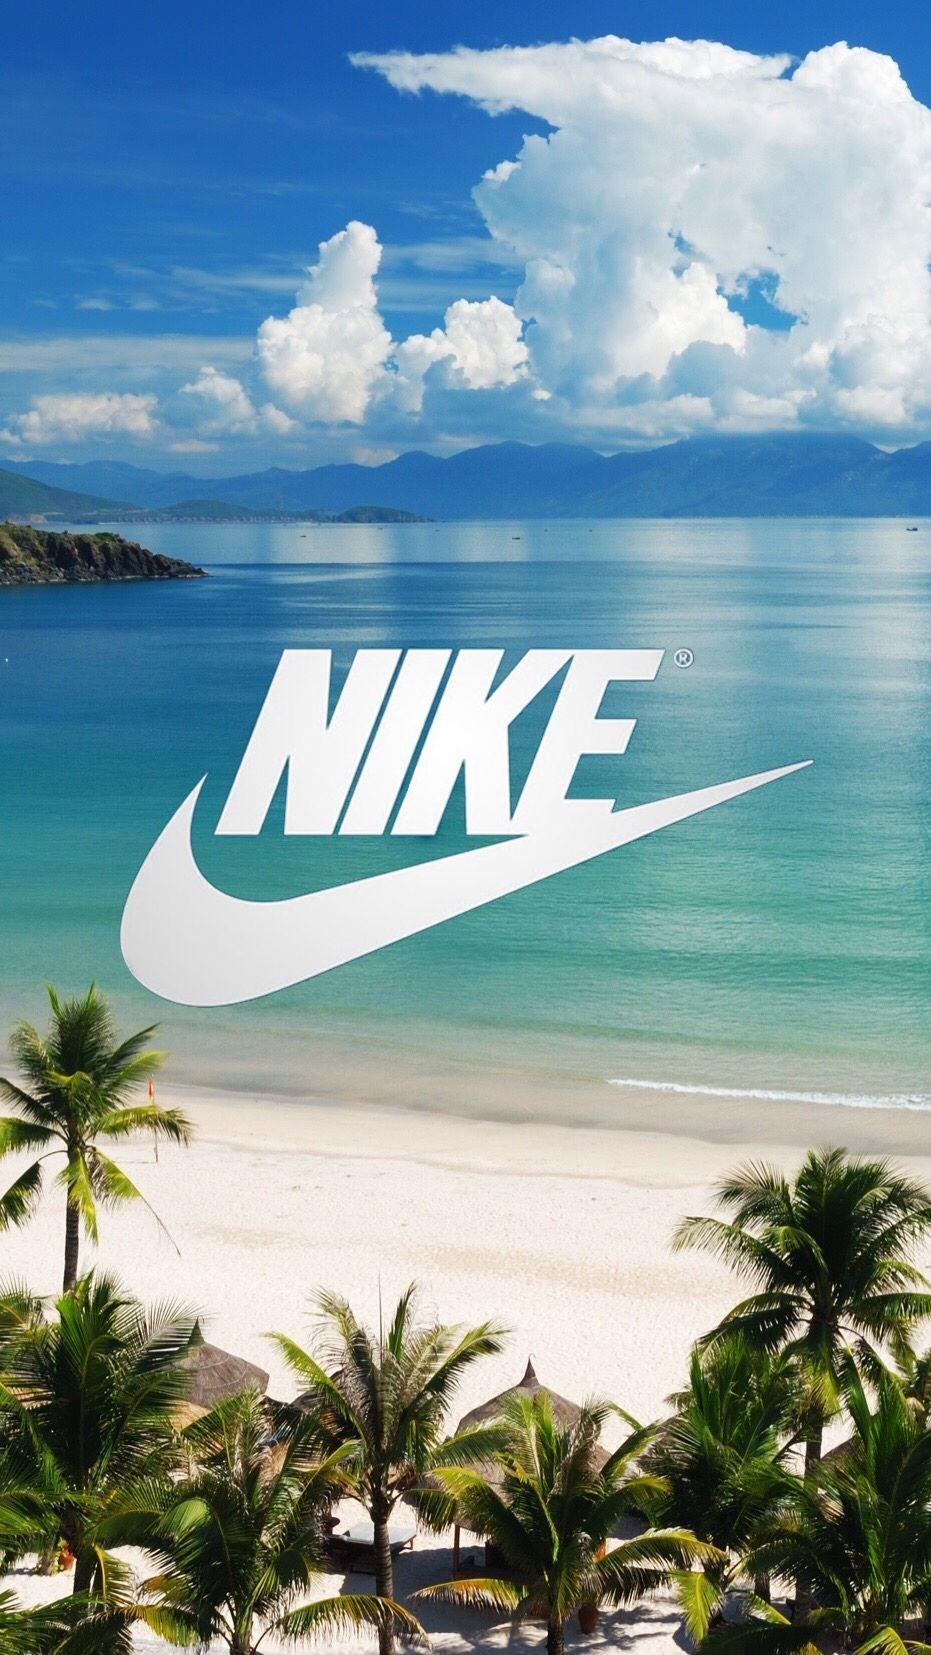 Nike Wallpaper Iphone 6s Nike Iphone 112158 Hd Wallpaper Backgrounds Download